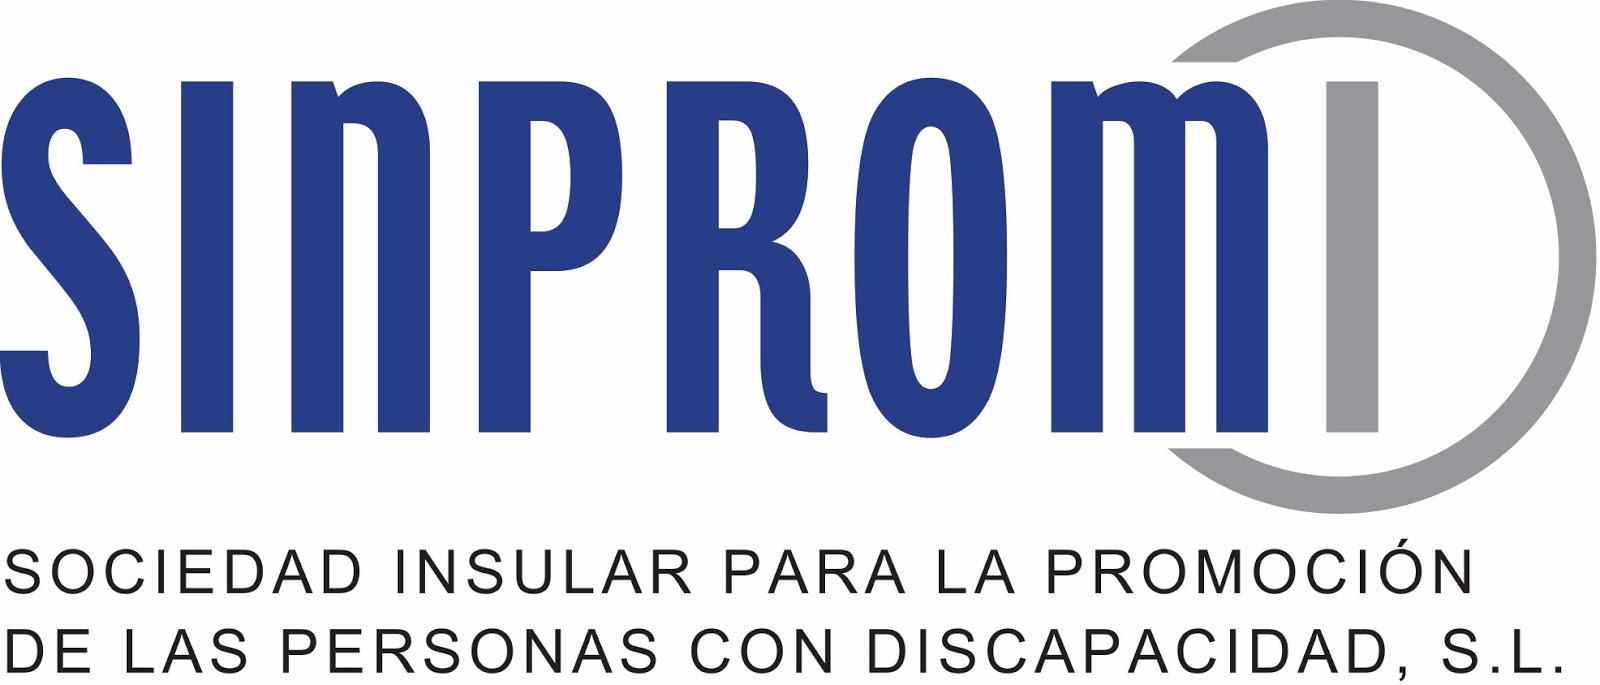 www.tenerife.es